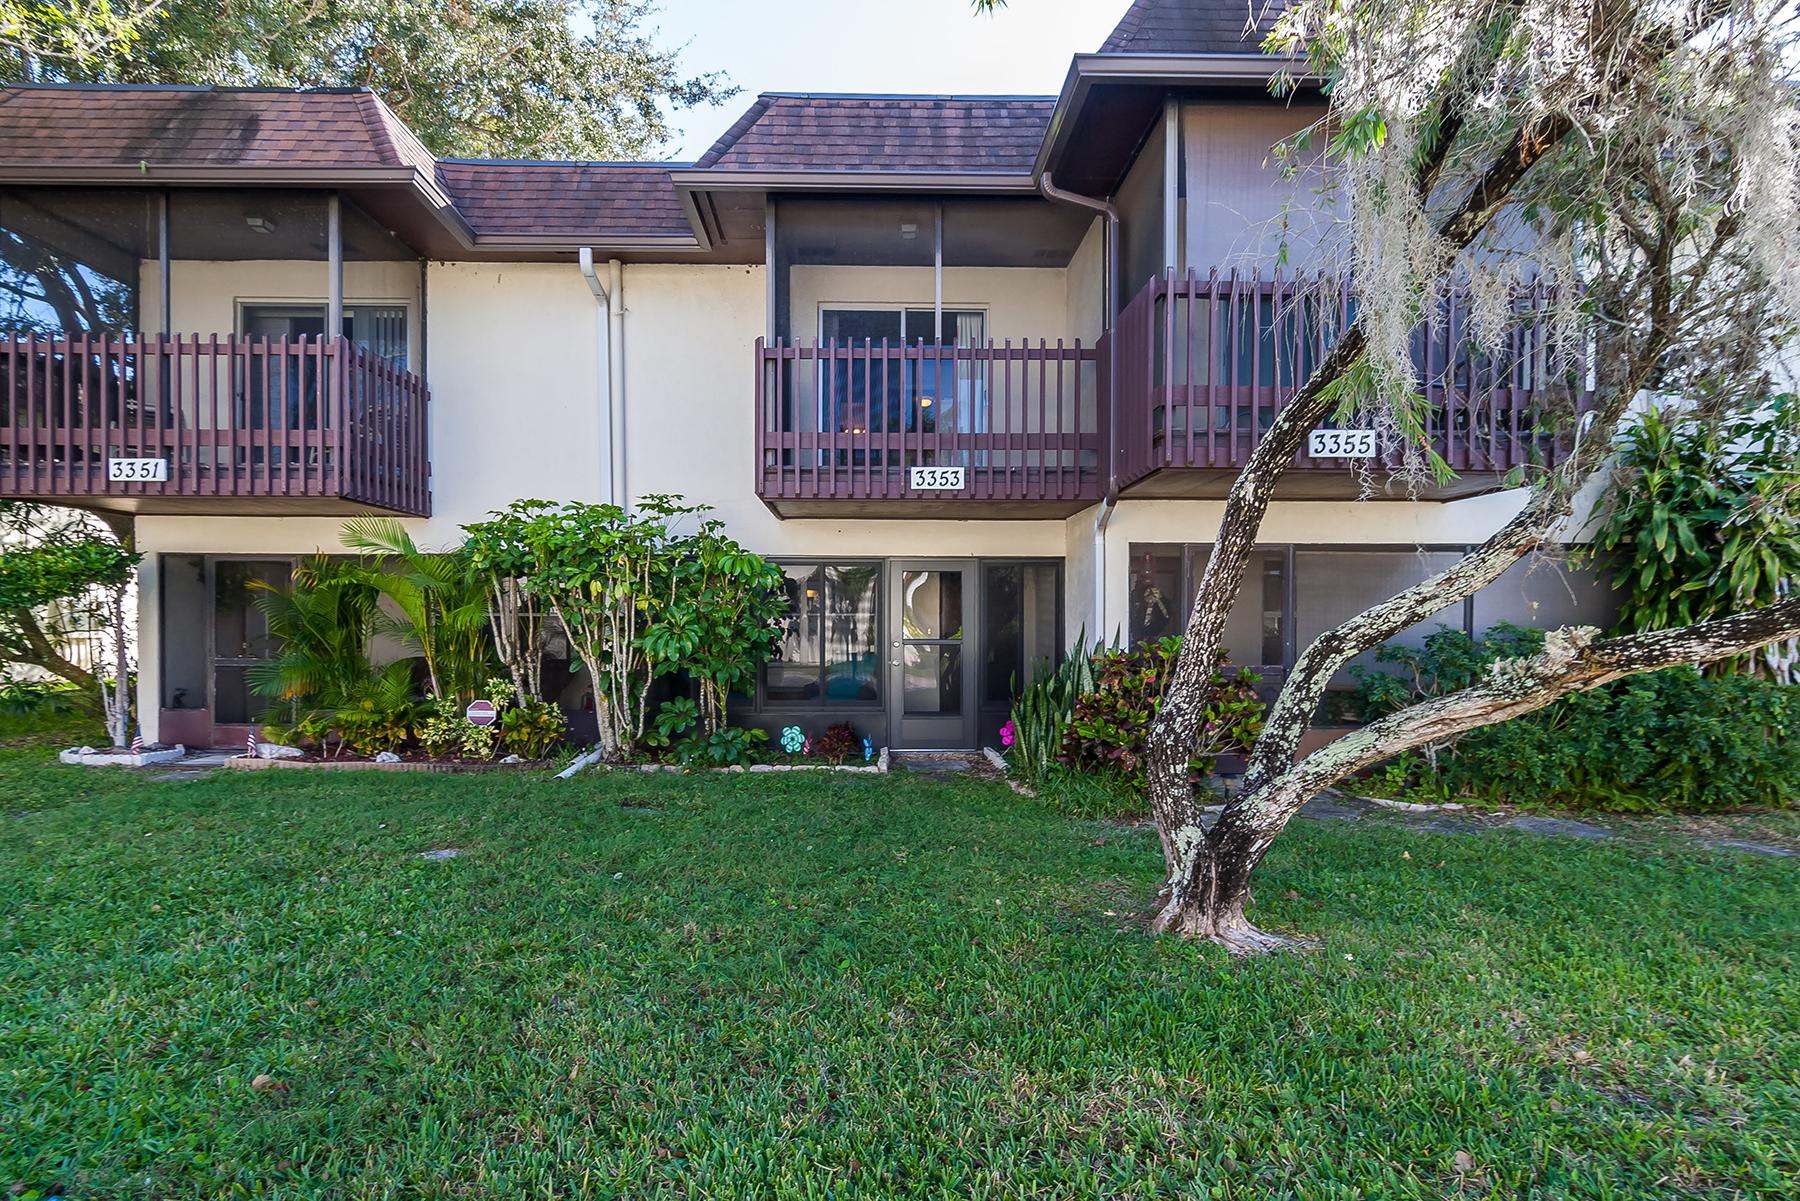 Townhouse for Sale at RAMBLEWOOD ACRES 3353 Ramblewood Dr N 35C2 Sarasota, Florida, 34237 United States